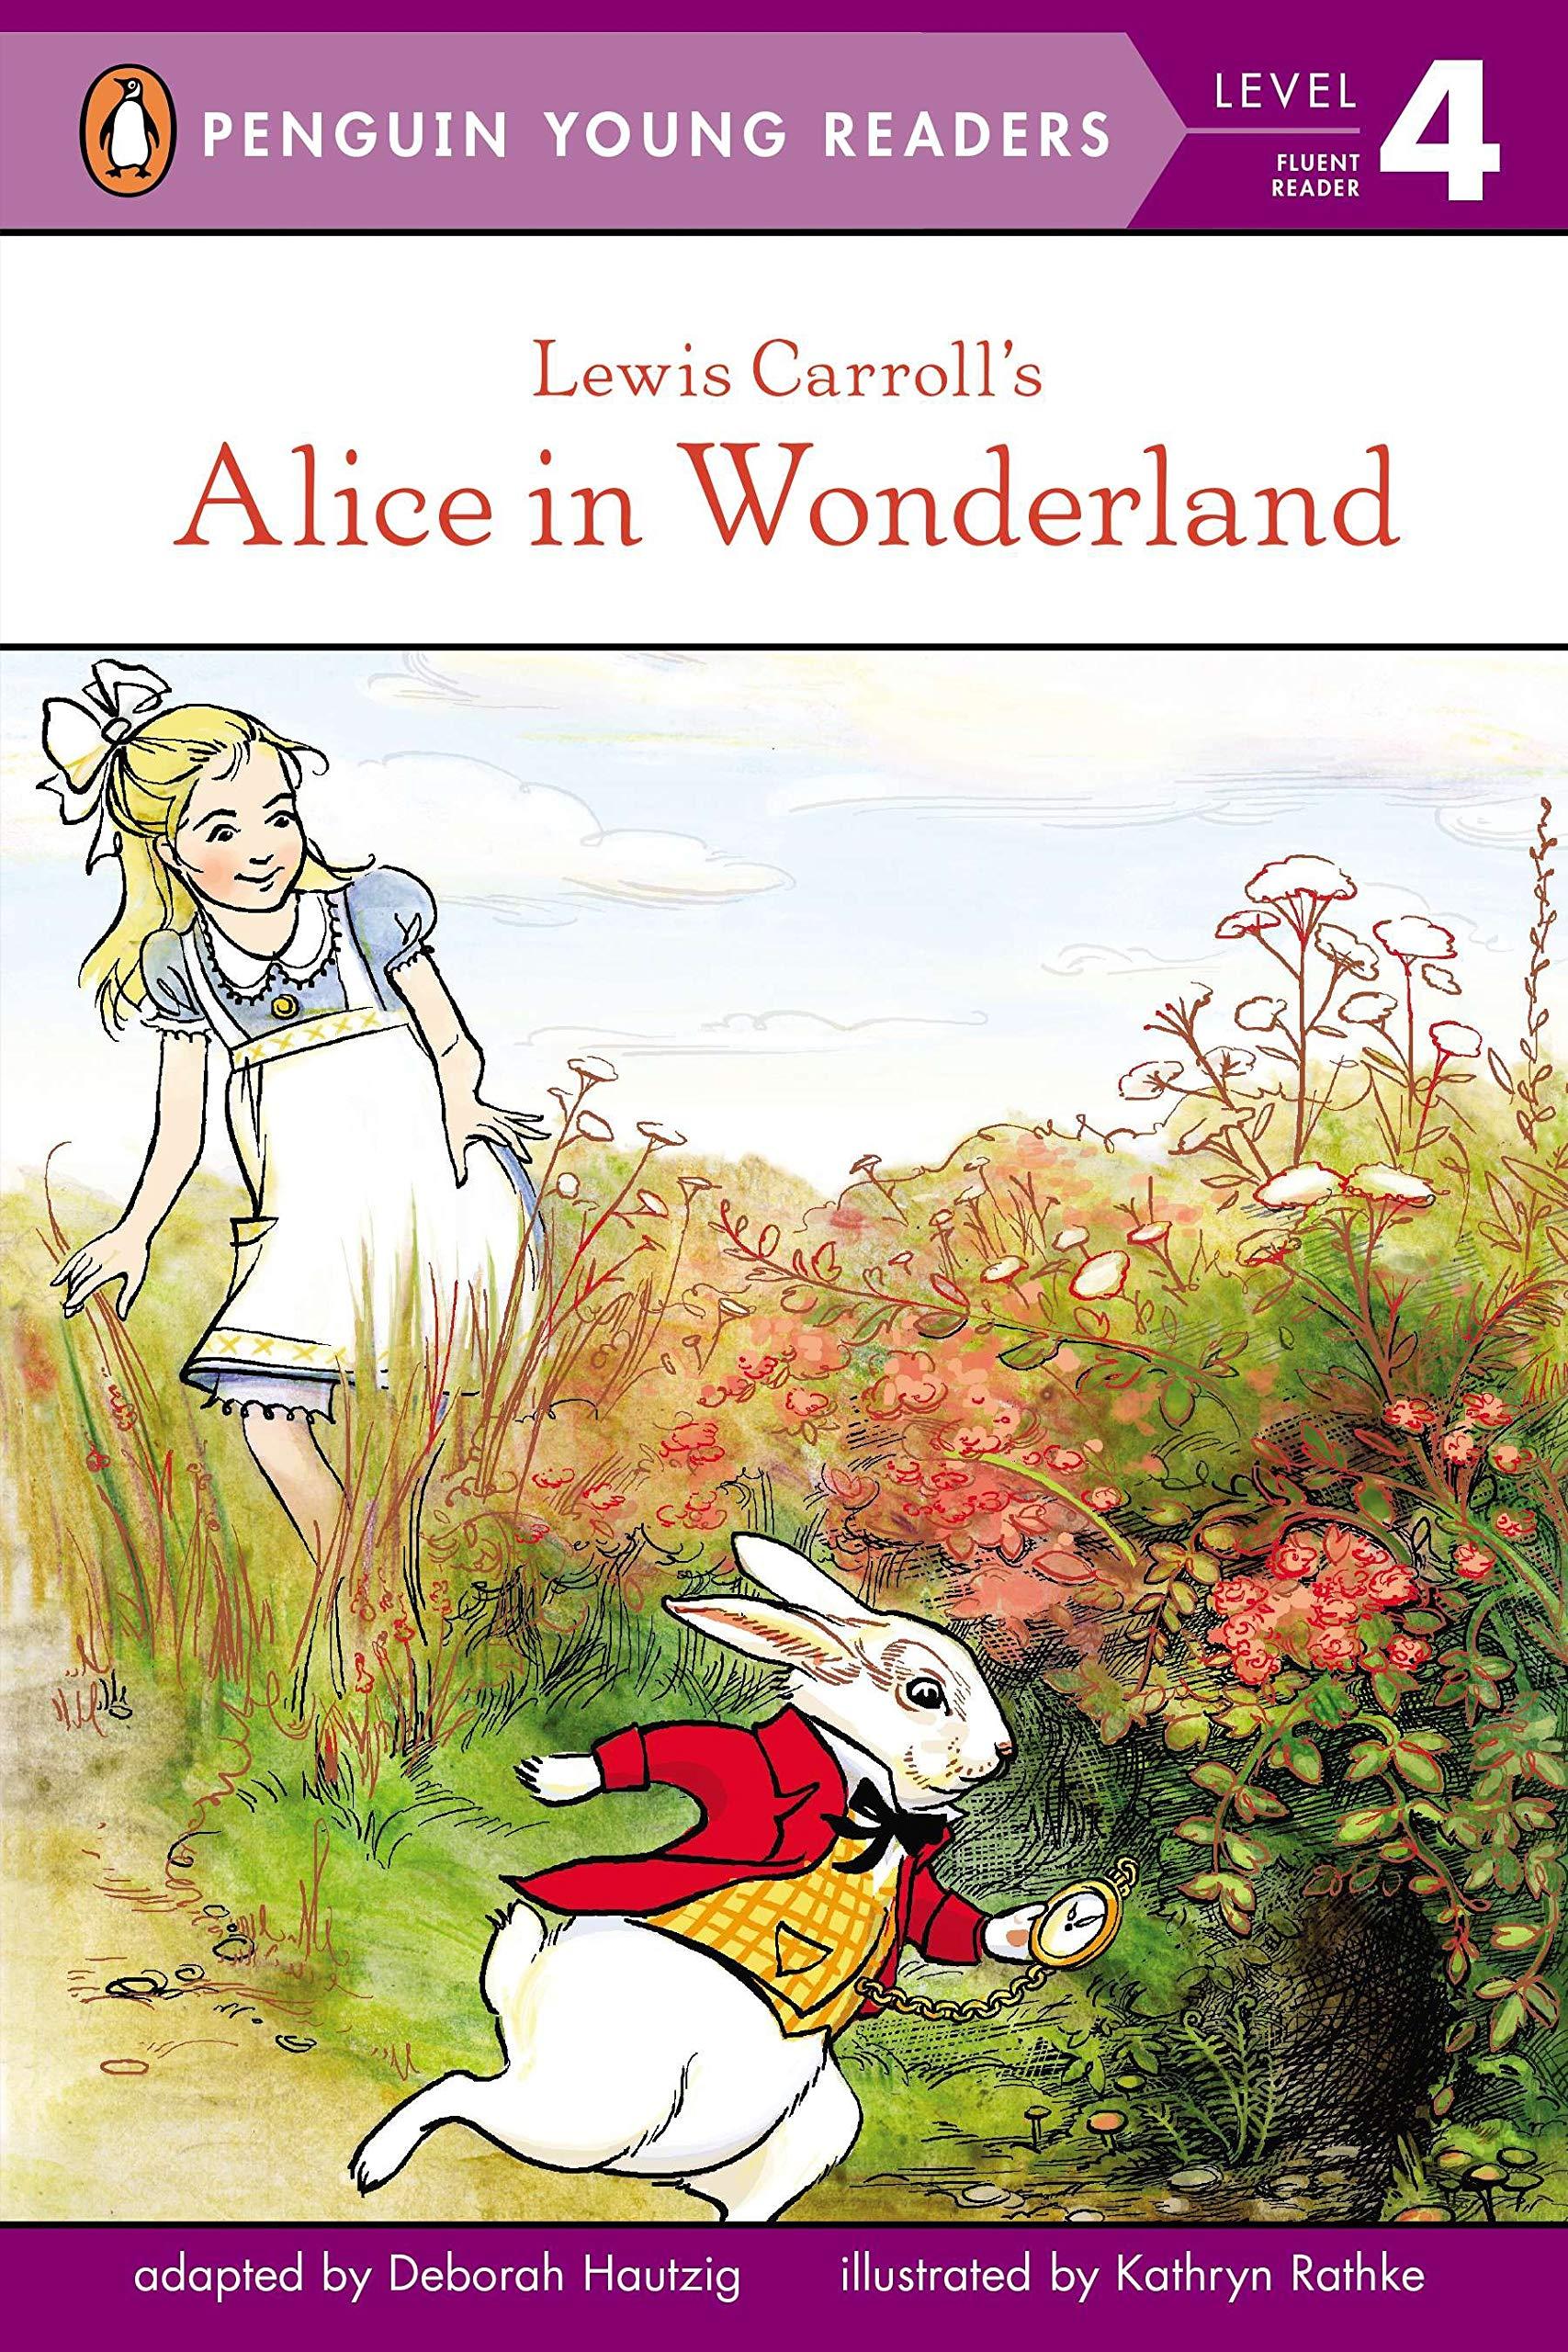 easy reader edition of Alice in Wonderland